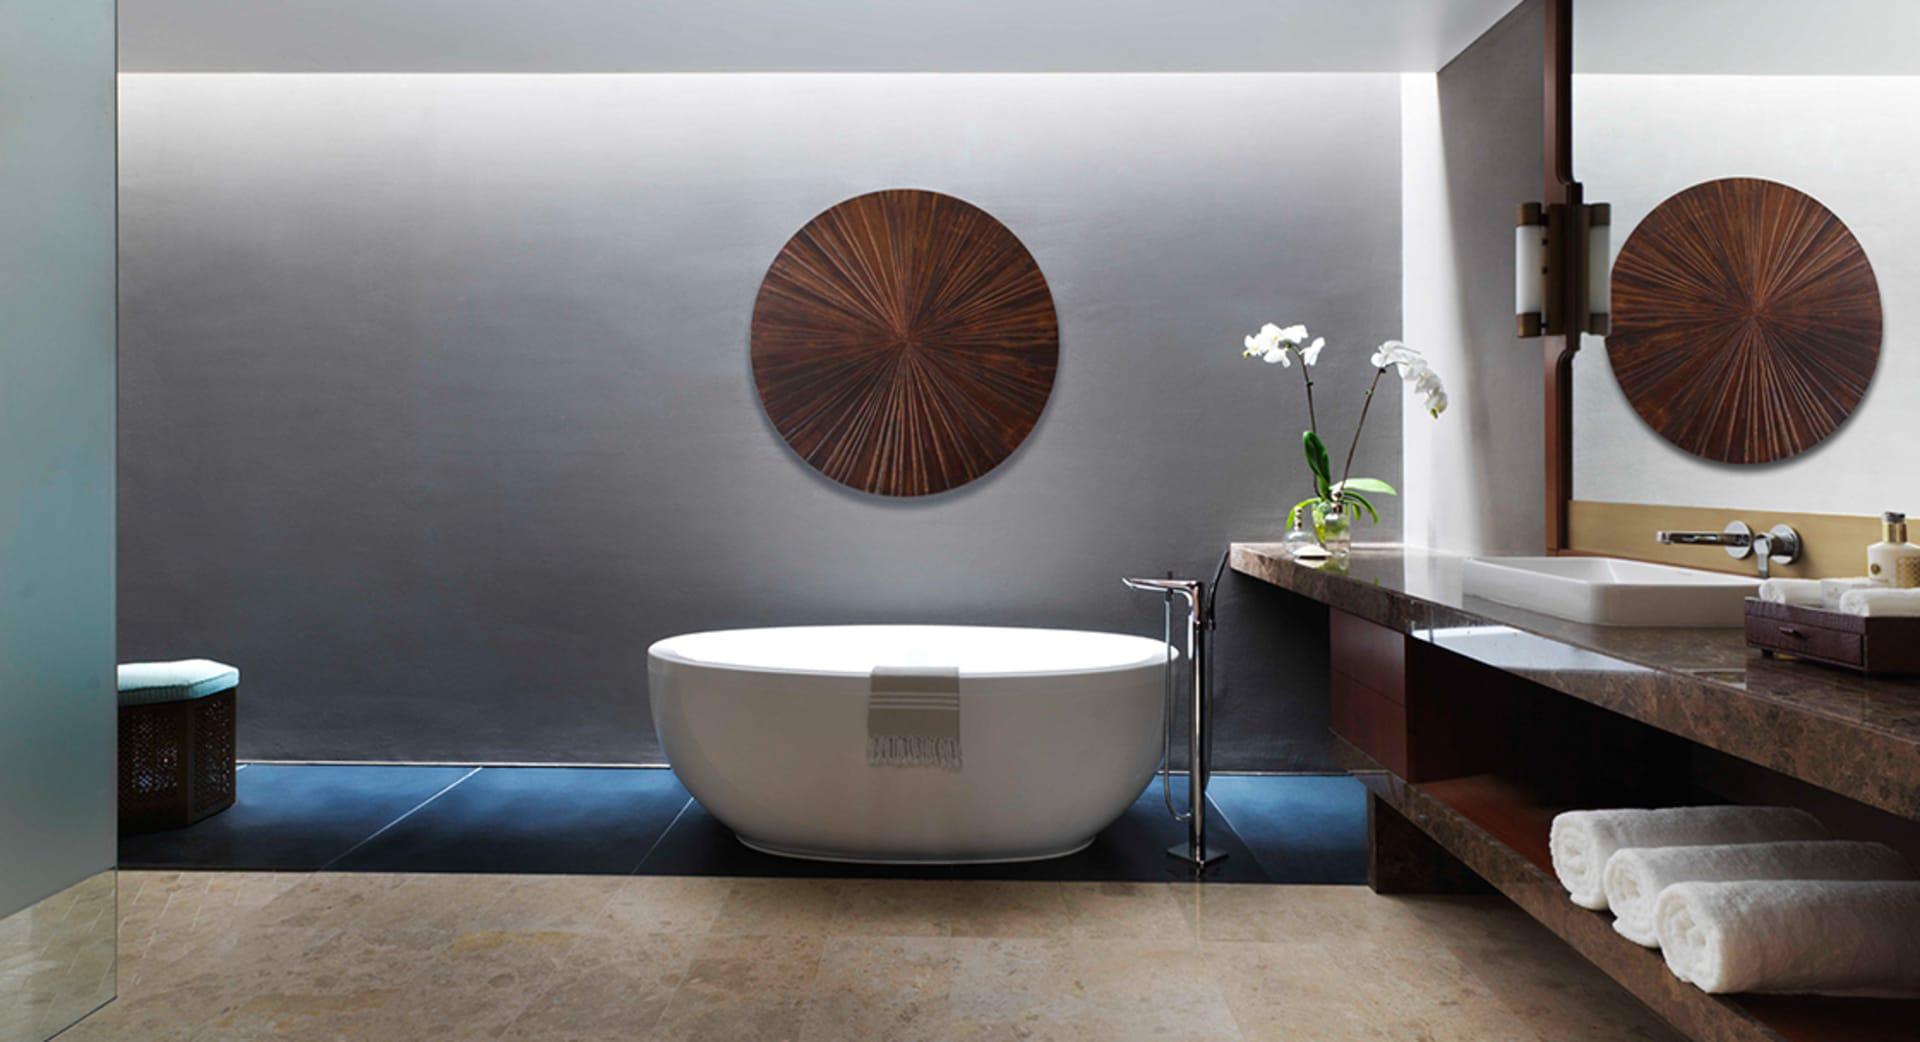 Deluxe Bathrooms of Beach View Villas with Private Bathtub at Anantara Oman